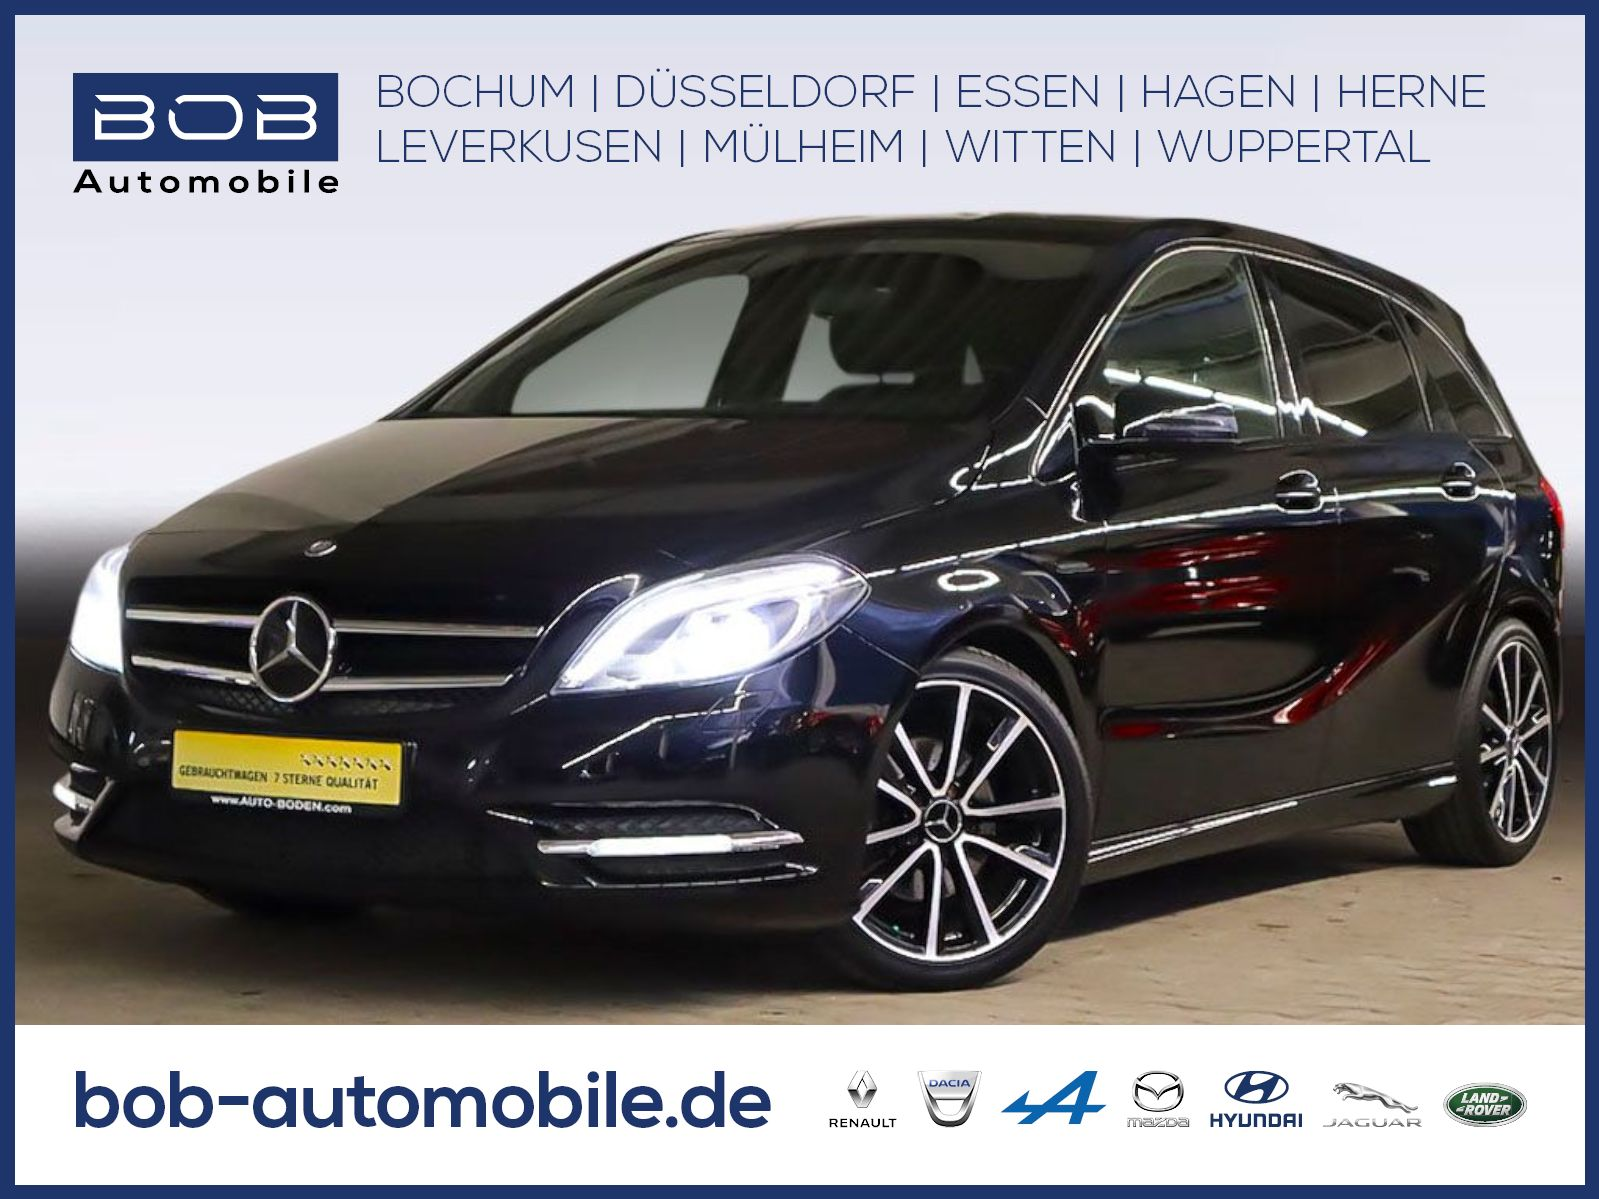 Mercedes-Benz B 180 BlueEFFICIENCY Edit. 1 XENON NAVI SHZ PDC, Jahr 2013, Benzin